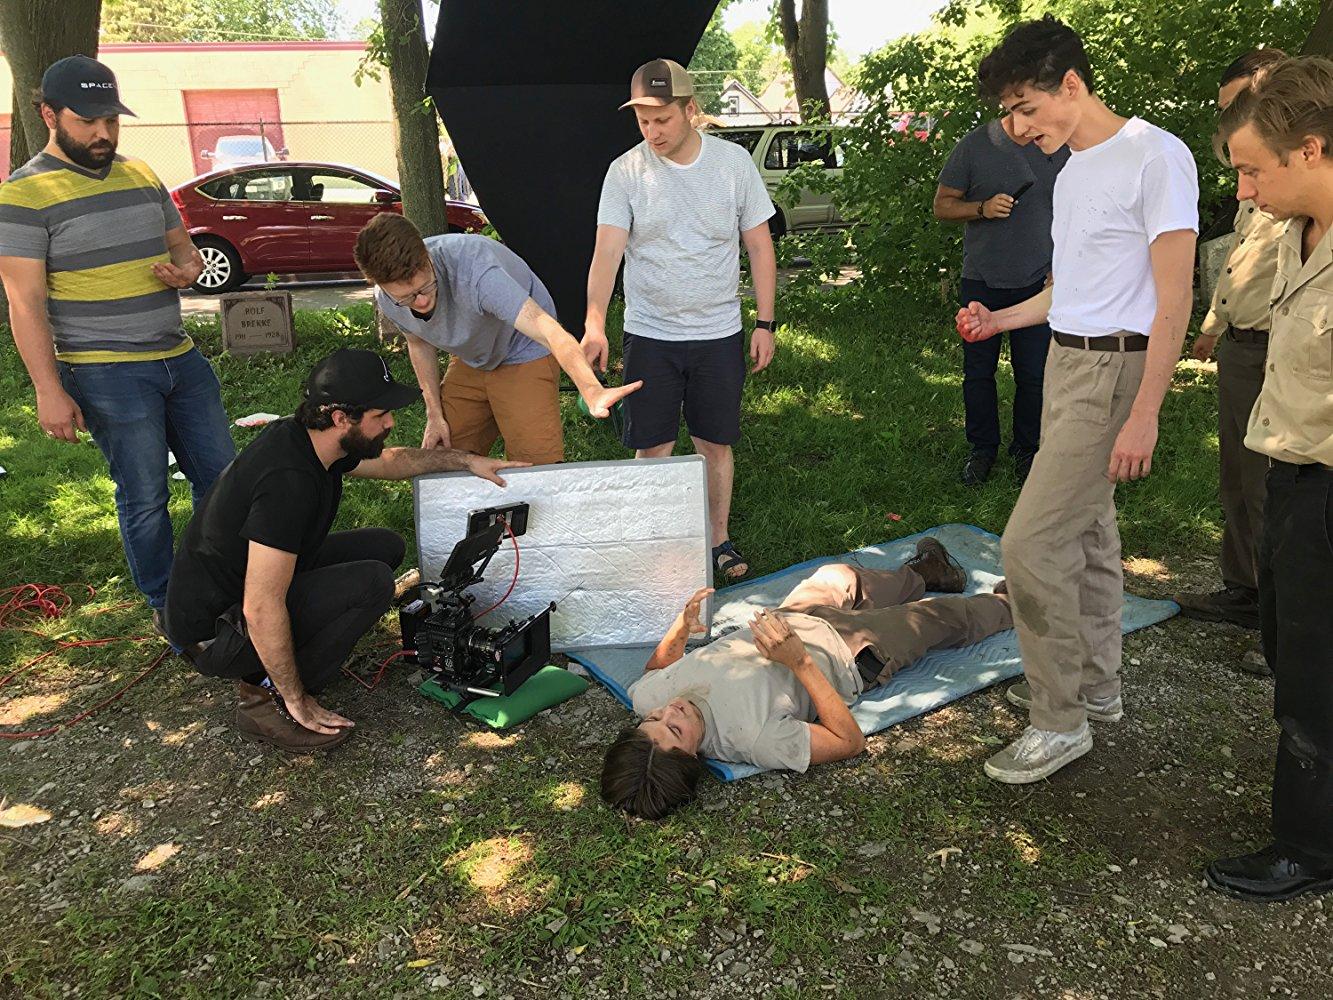 Filming the fight scene